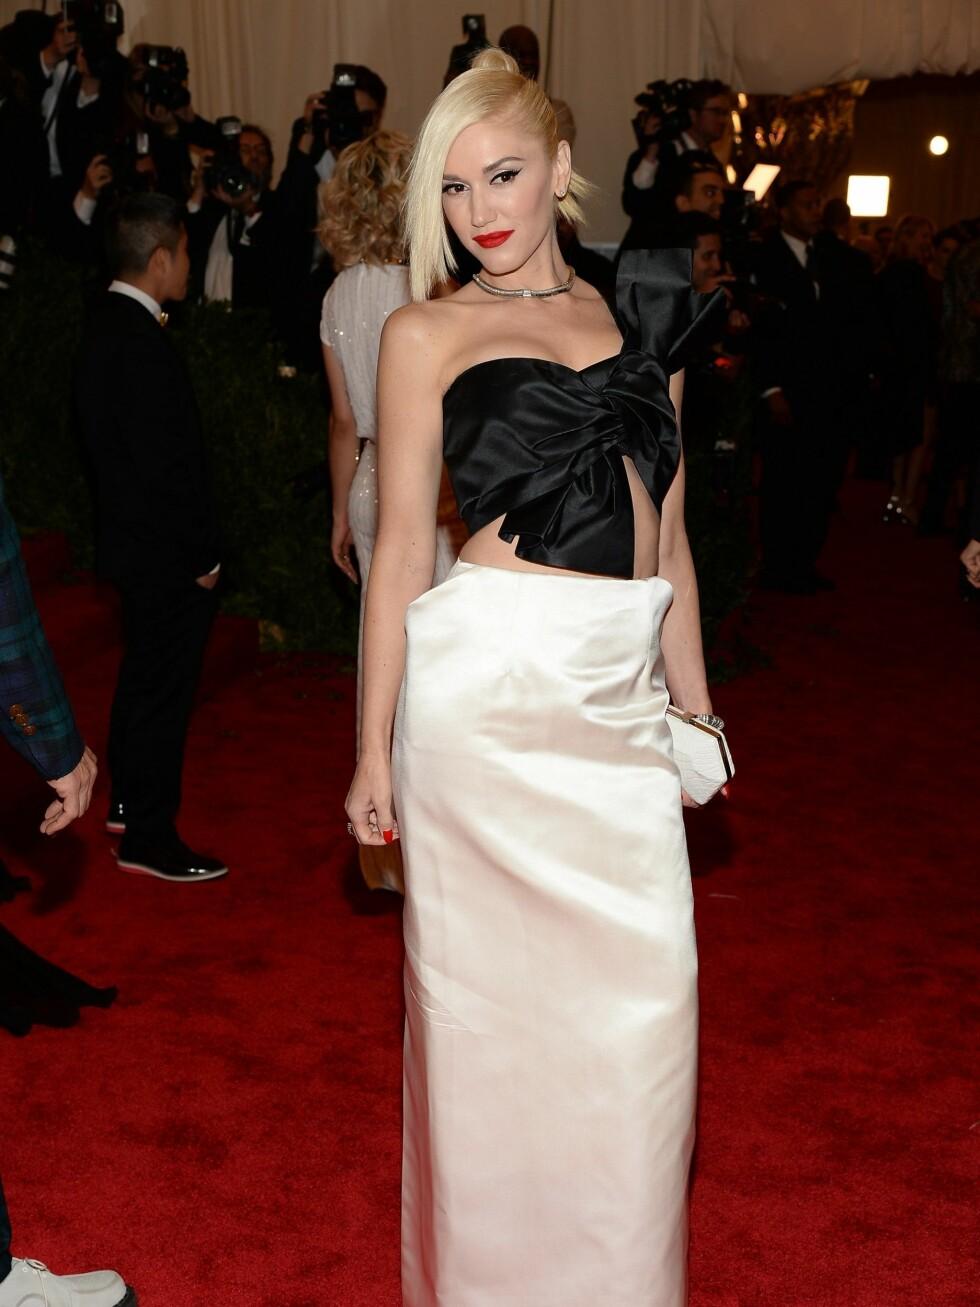 Gwen Stefani Foto: All Over Press